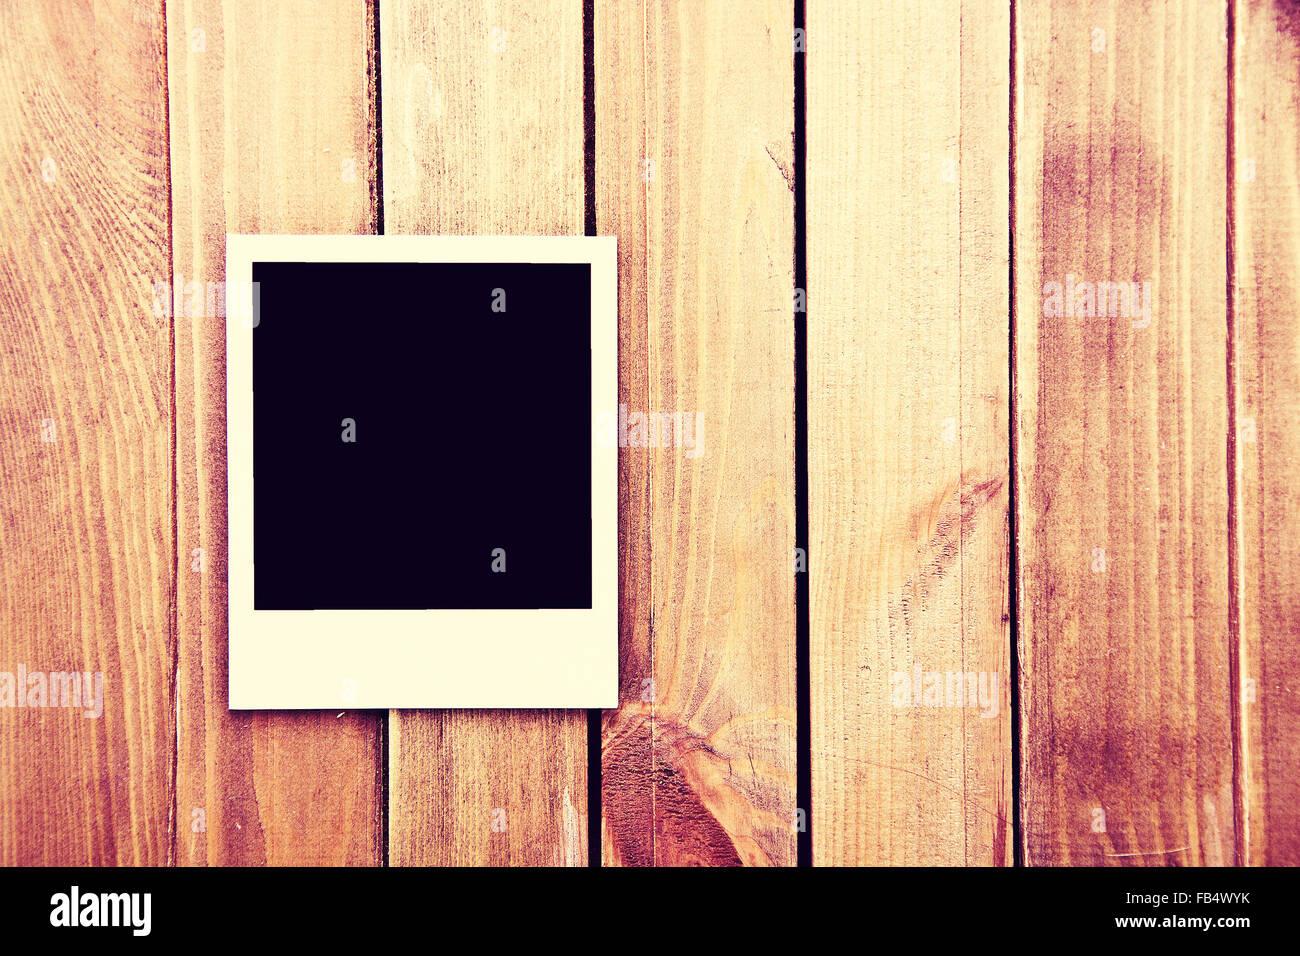 Instant blank polaroid photos frame on wooden background. Free copyspace. Vintage retro. - Stock Image